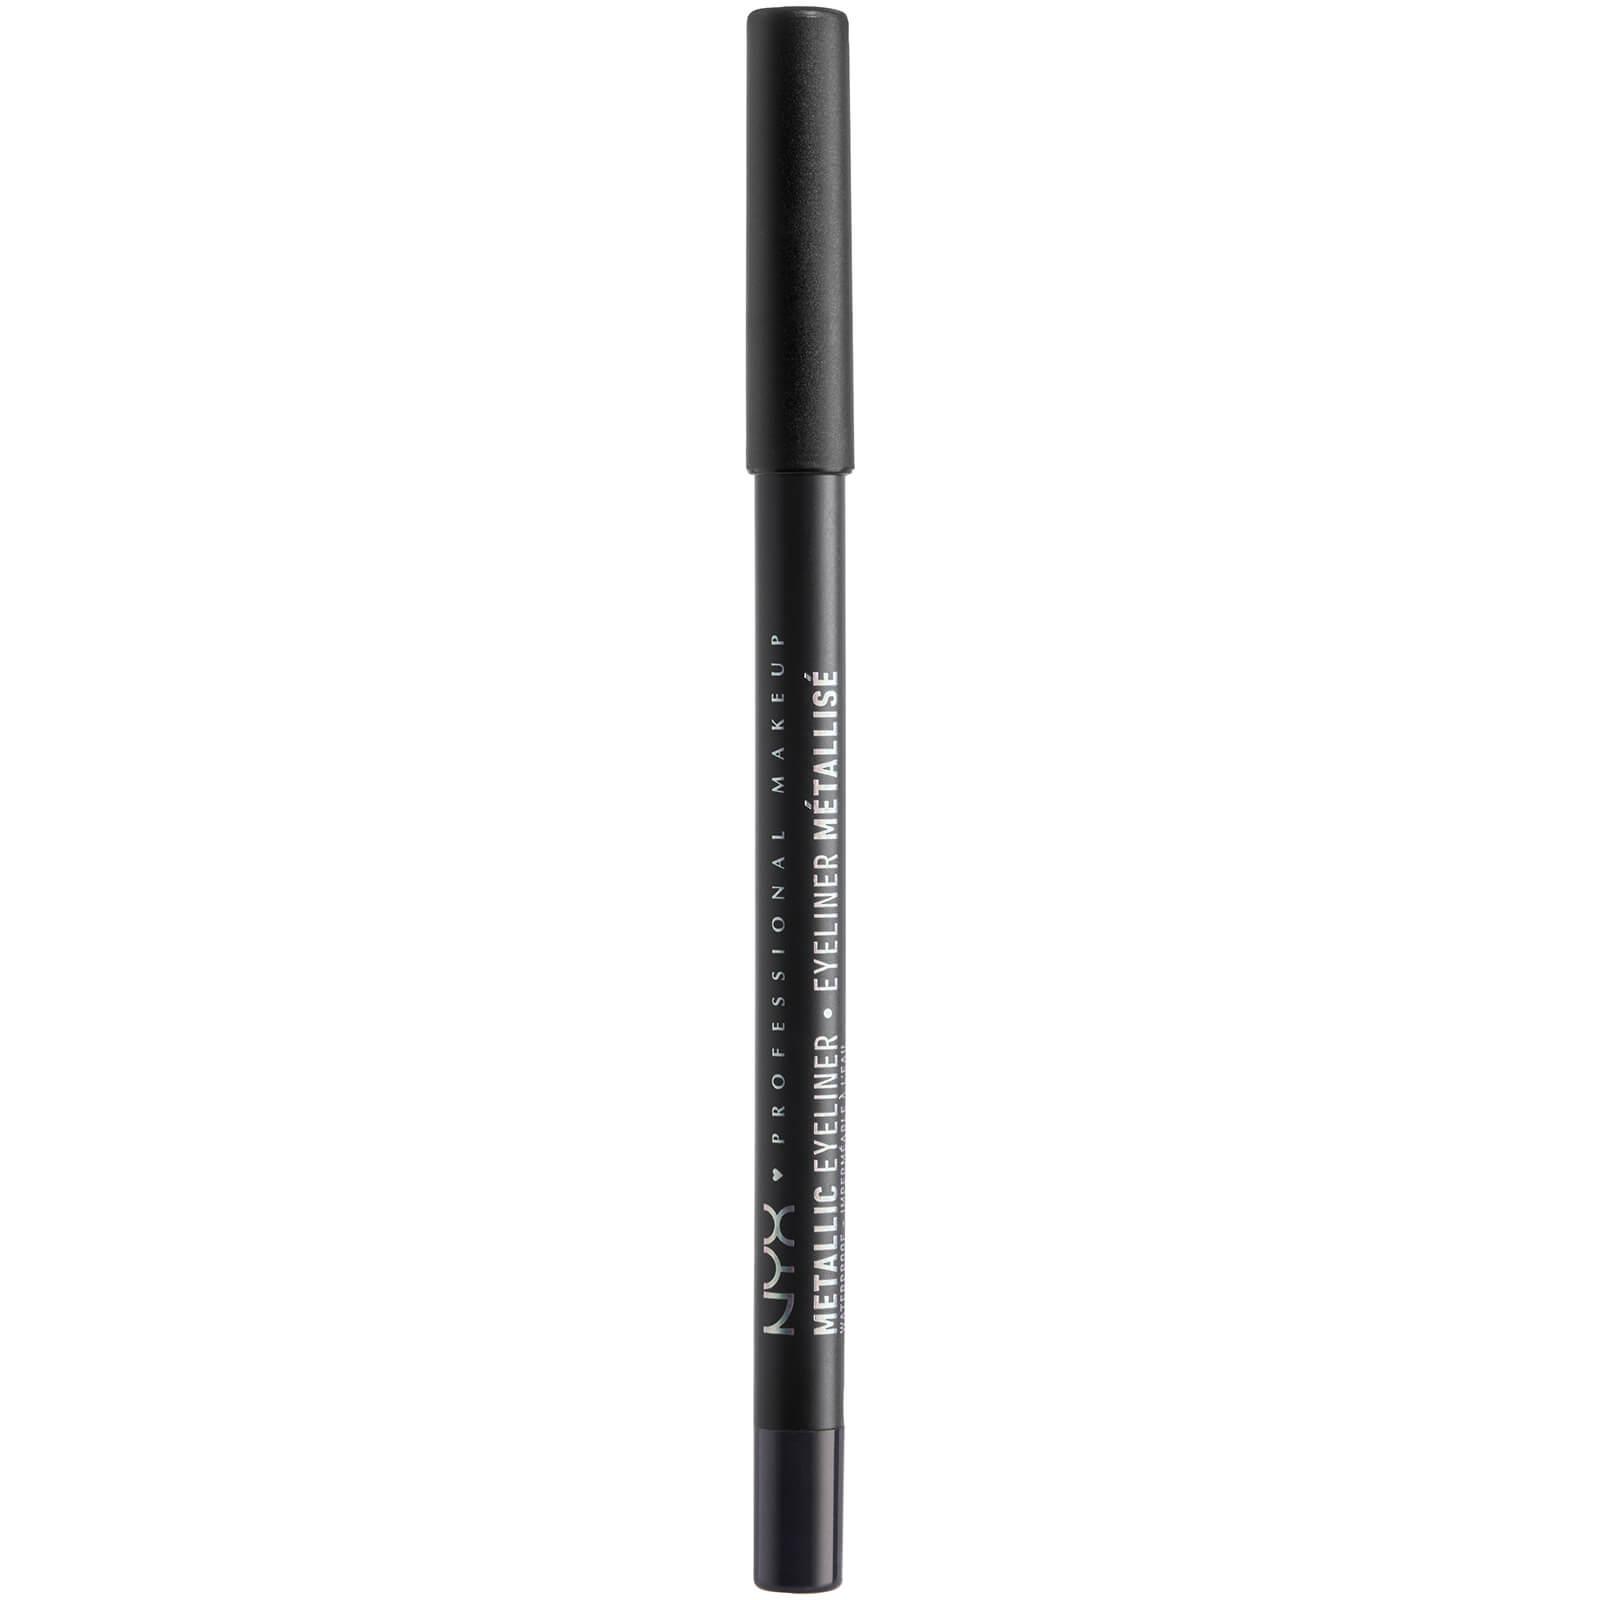 NYX Professional Makeup Metallic Eyeliner (Various Shades) - Black Metal